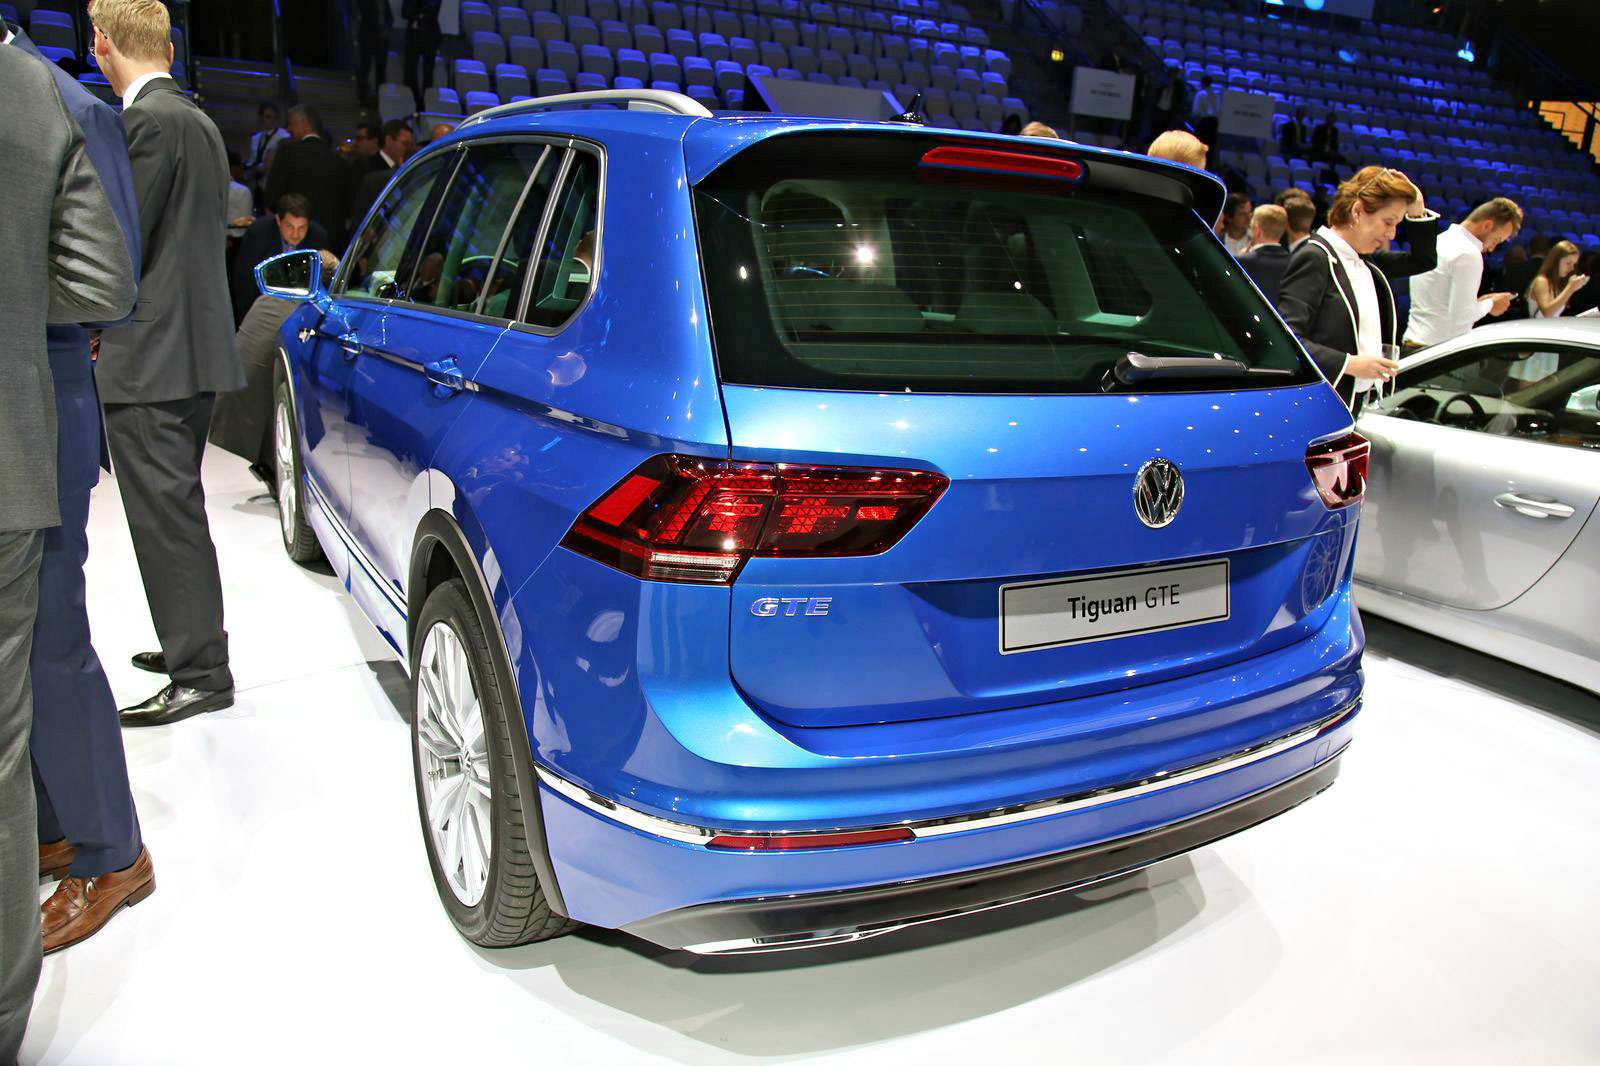 VW_Tiguan_GTE_Kadakov_1